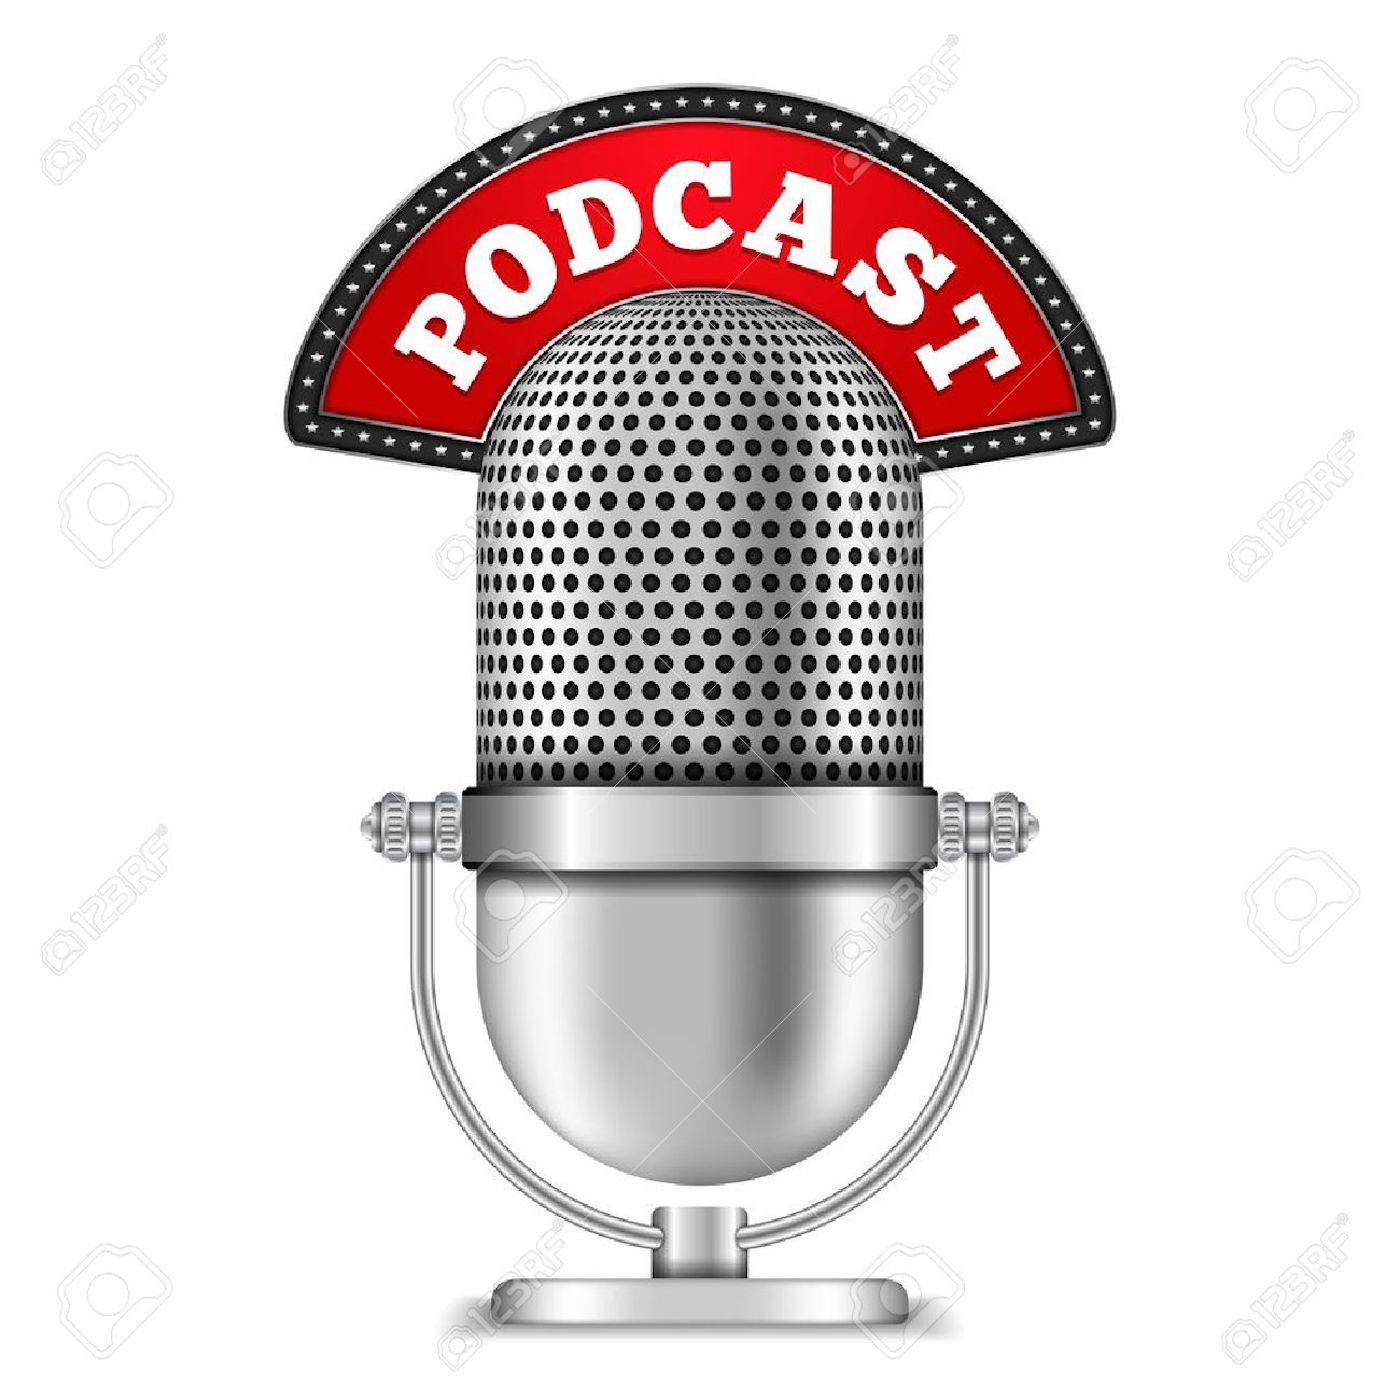 La escucha de podcast a través del celular, se encuentra en un vertiginoso aumento